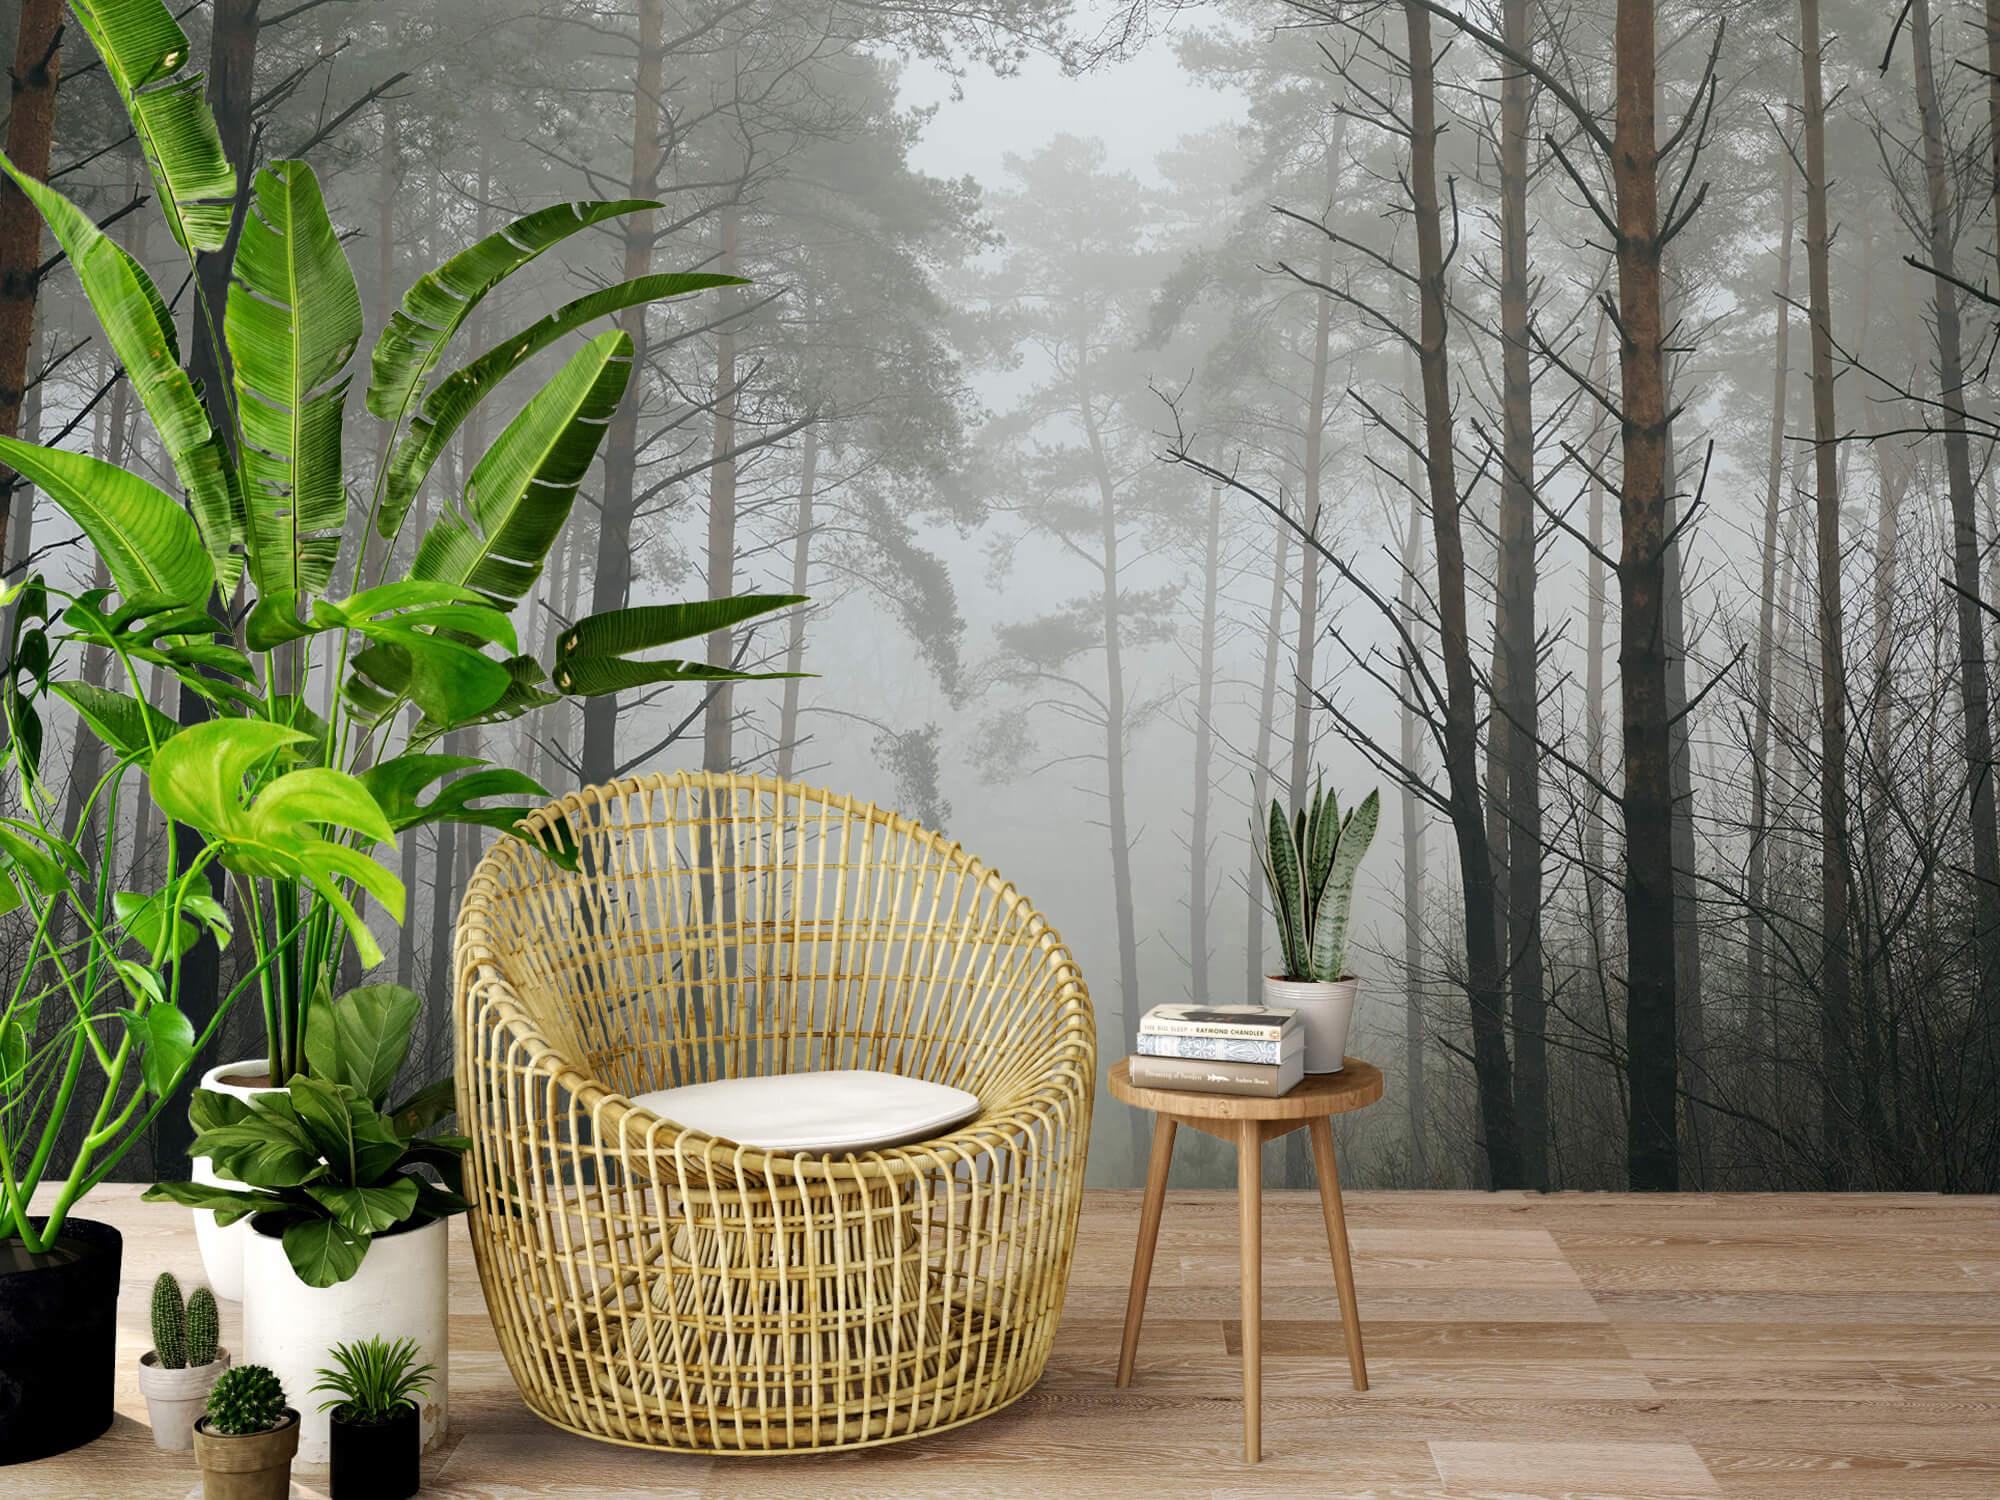 Natuur Pad in mistig bos 6